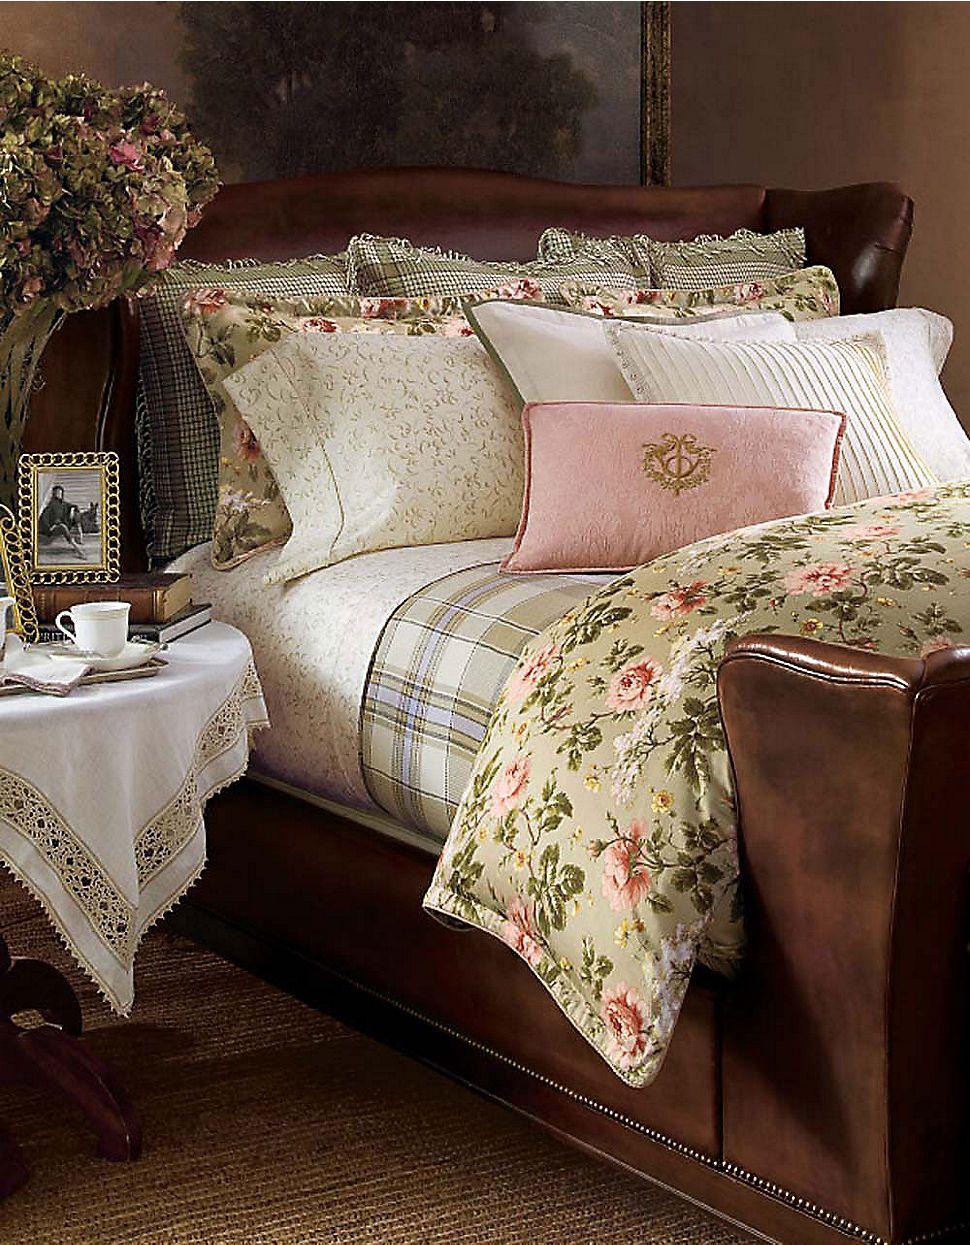 ralph lauren bedding shabby chic r o s a bett. Black Bedroom Furniture Sets. Home Design Ideas